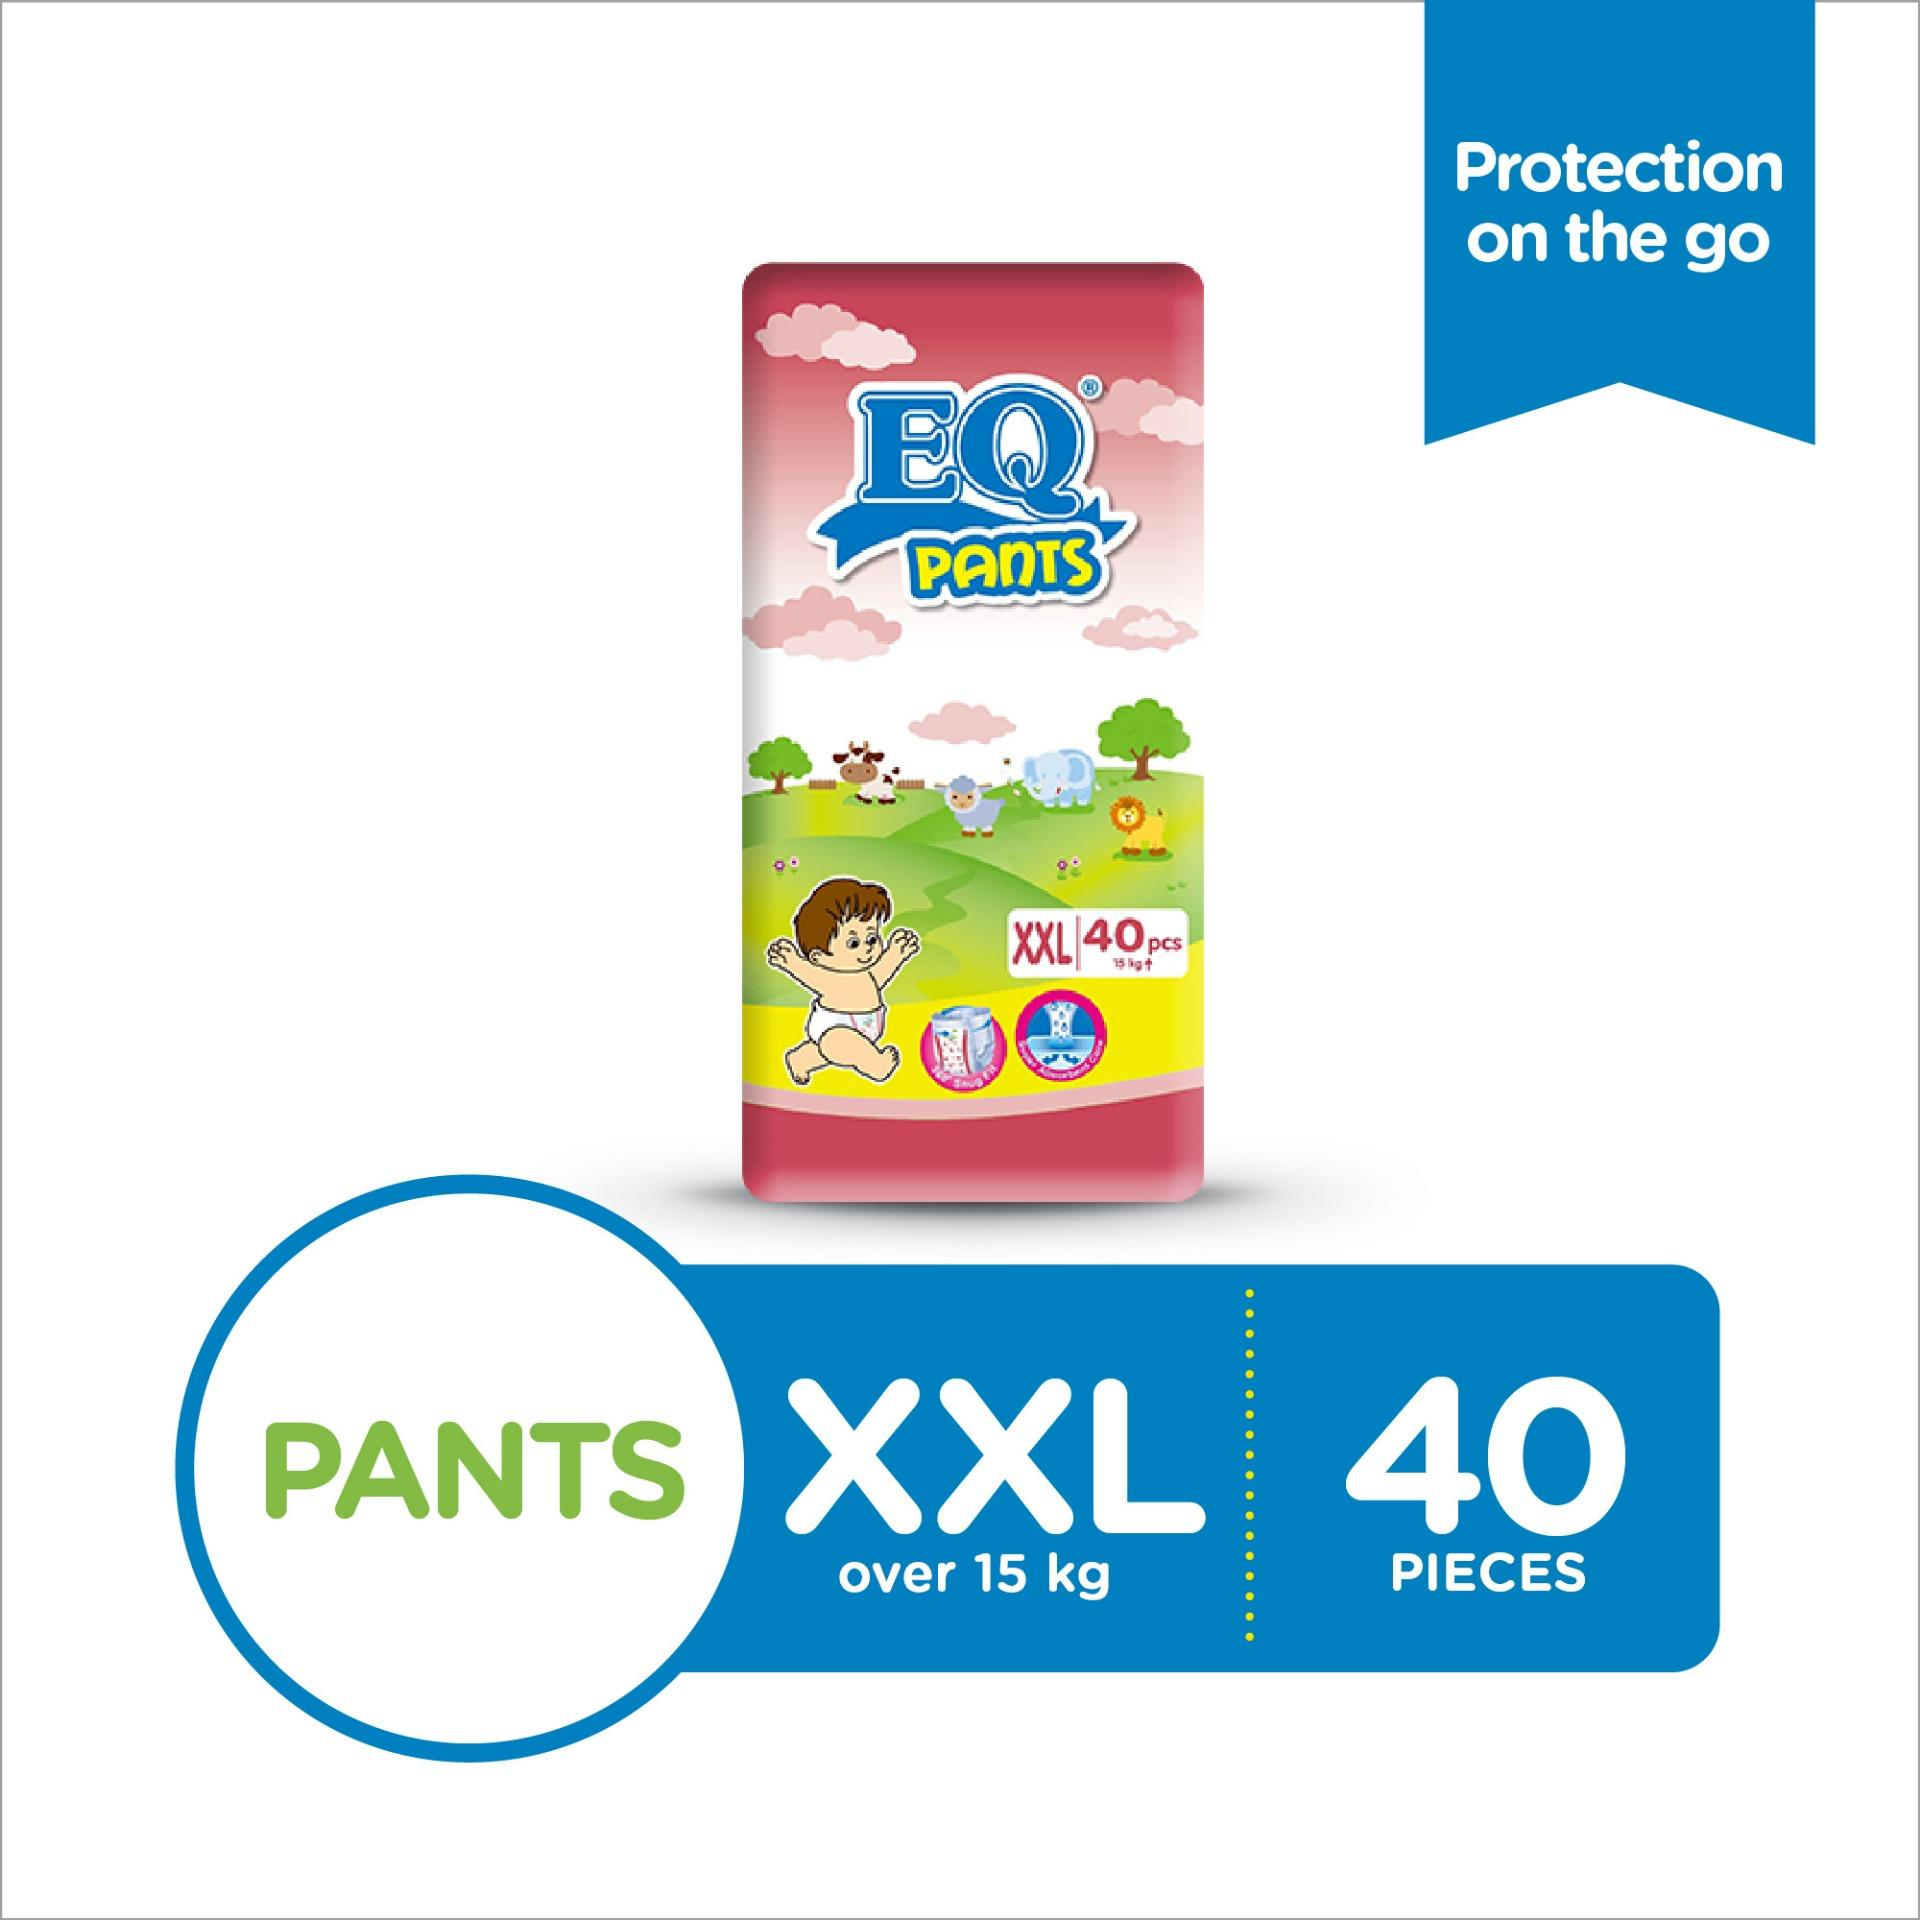 Eq Pants Xxl (15 - 25 Kg) - 40 Pcs X 1 Pack (40 Pcs) - Diaper Pants By Lazada Retail Eq.